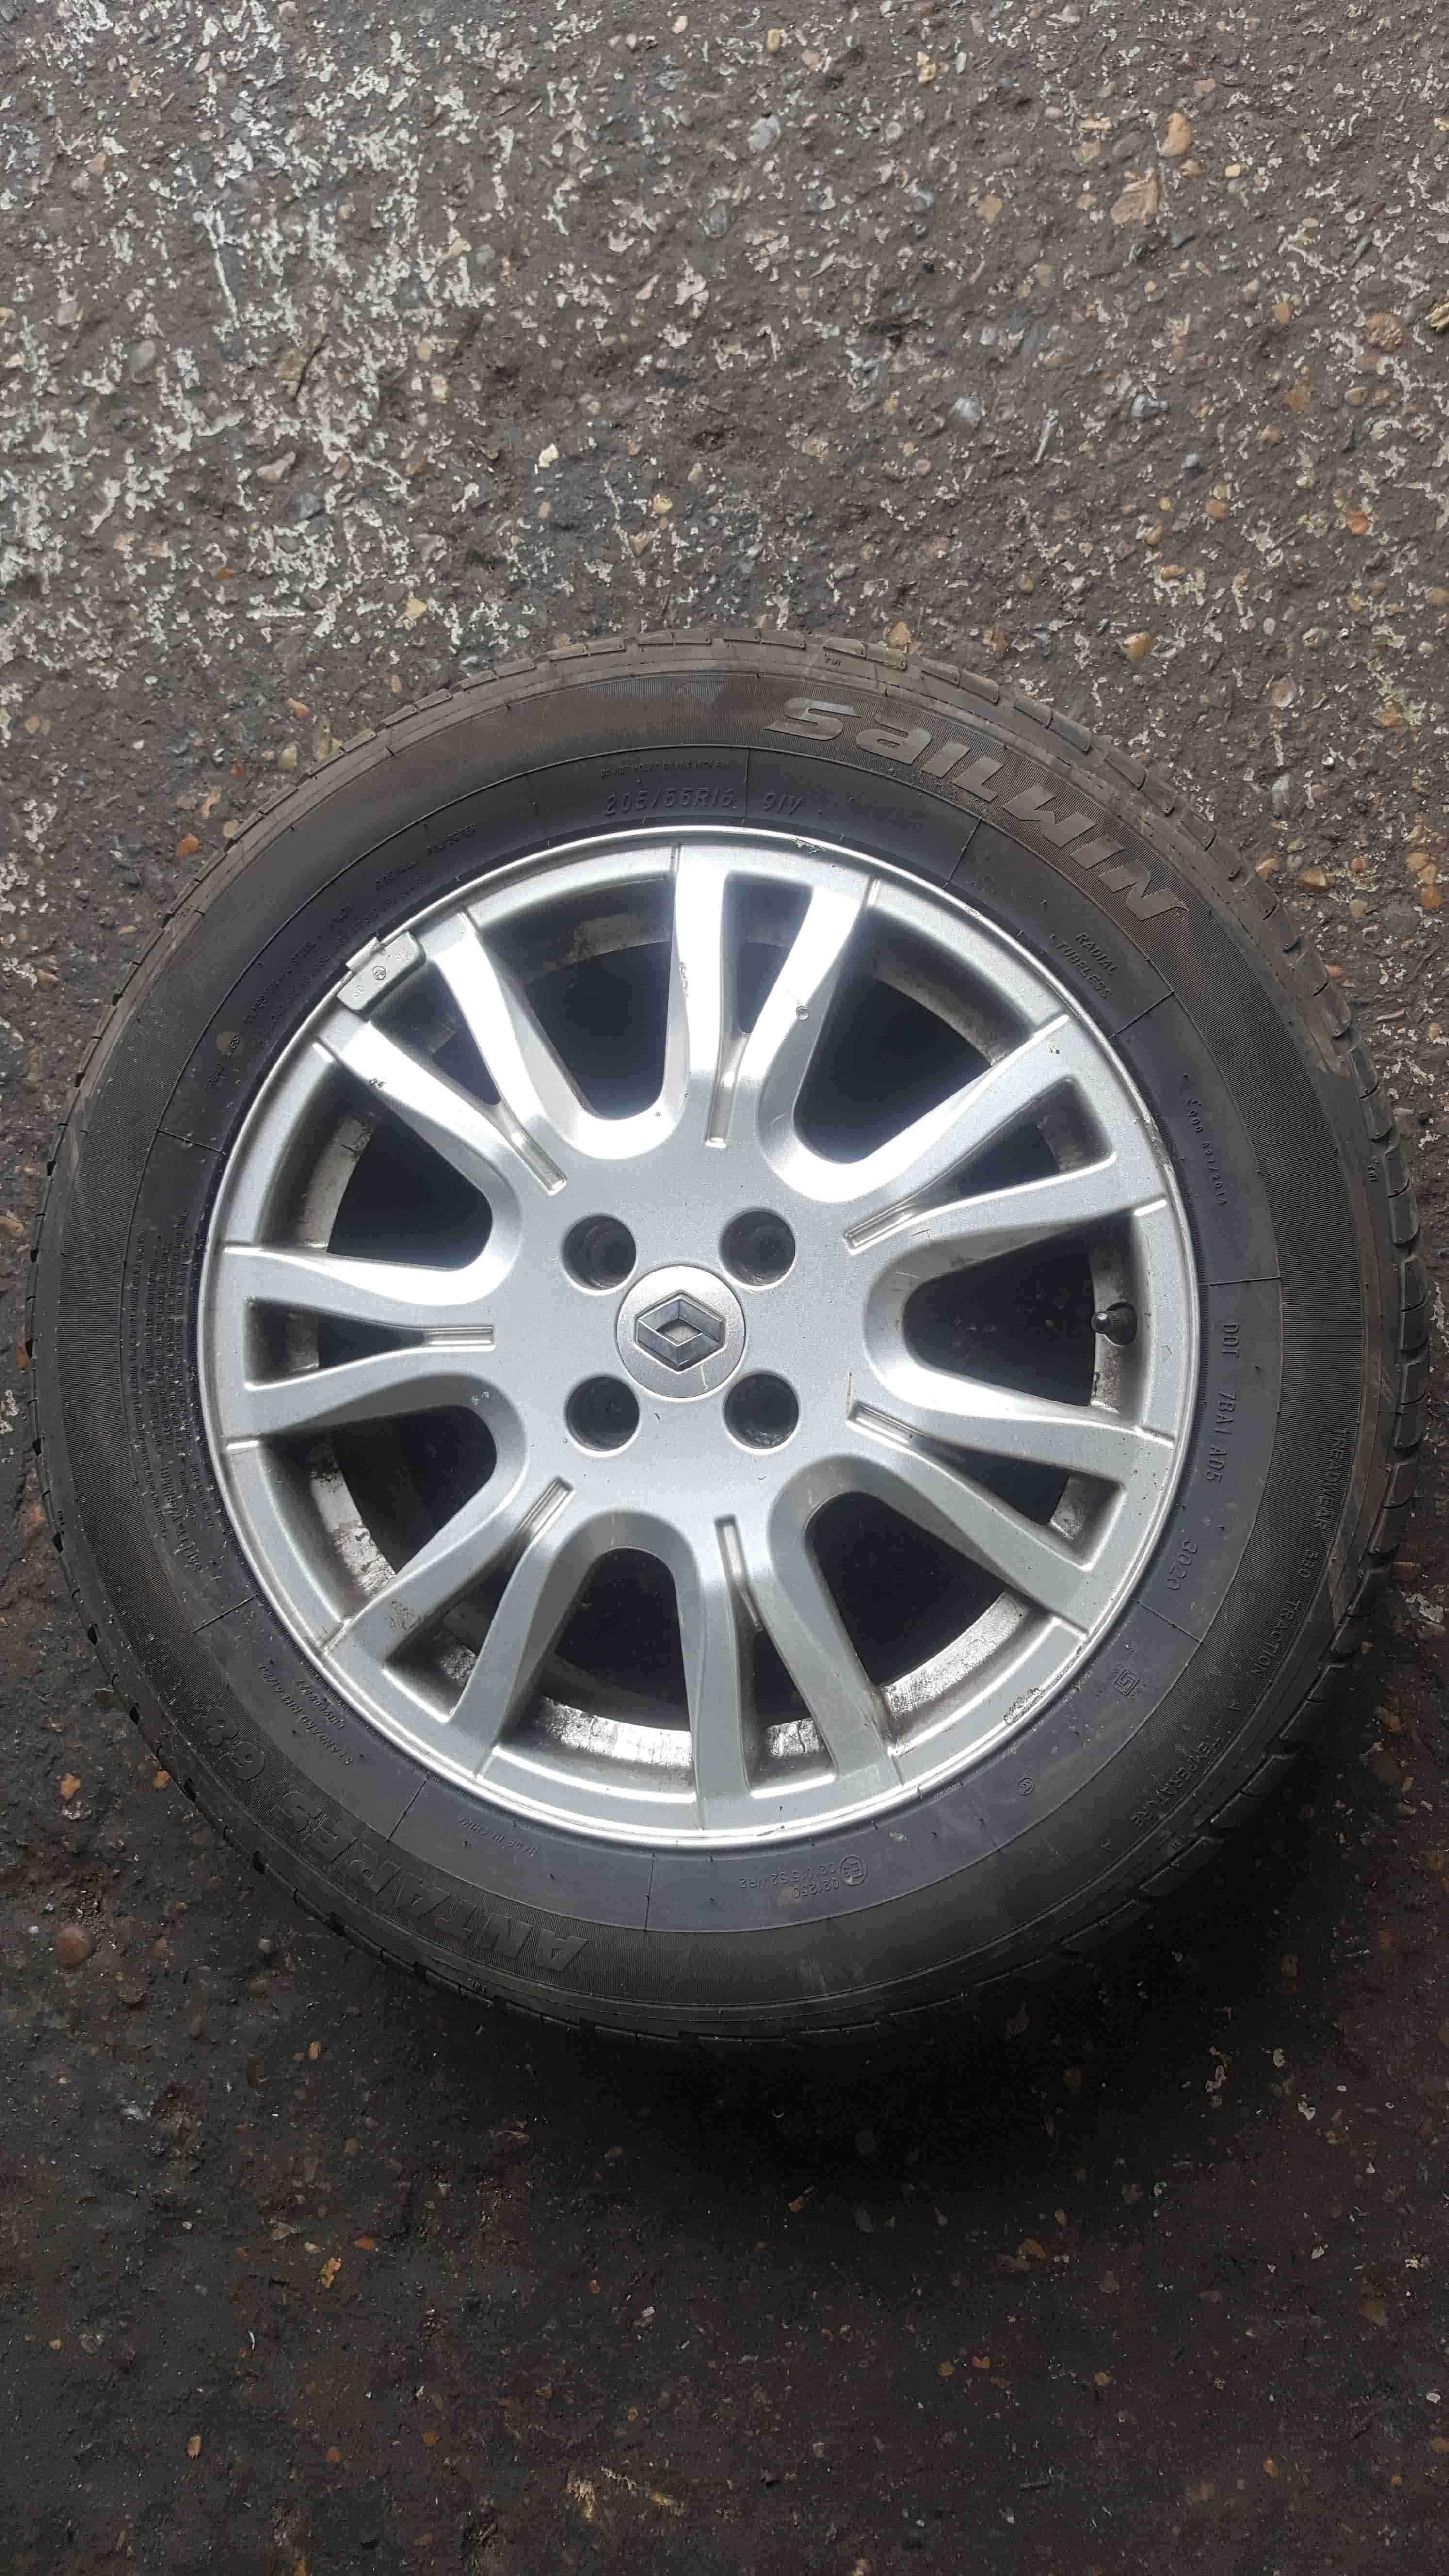 Renault Megane 2002-2008 Ozedia Alloy Wheel + Tyre 205 55 16 6mm